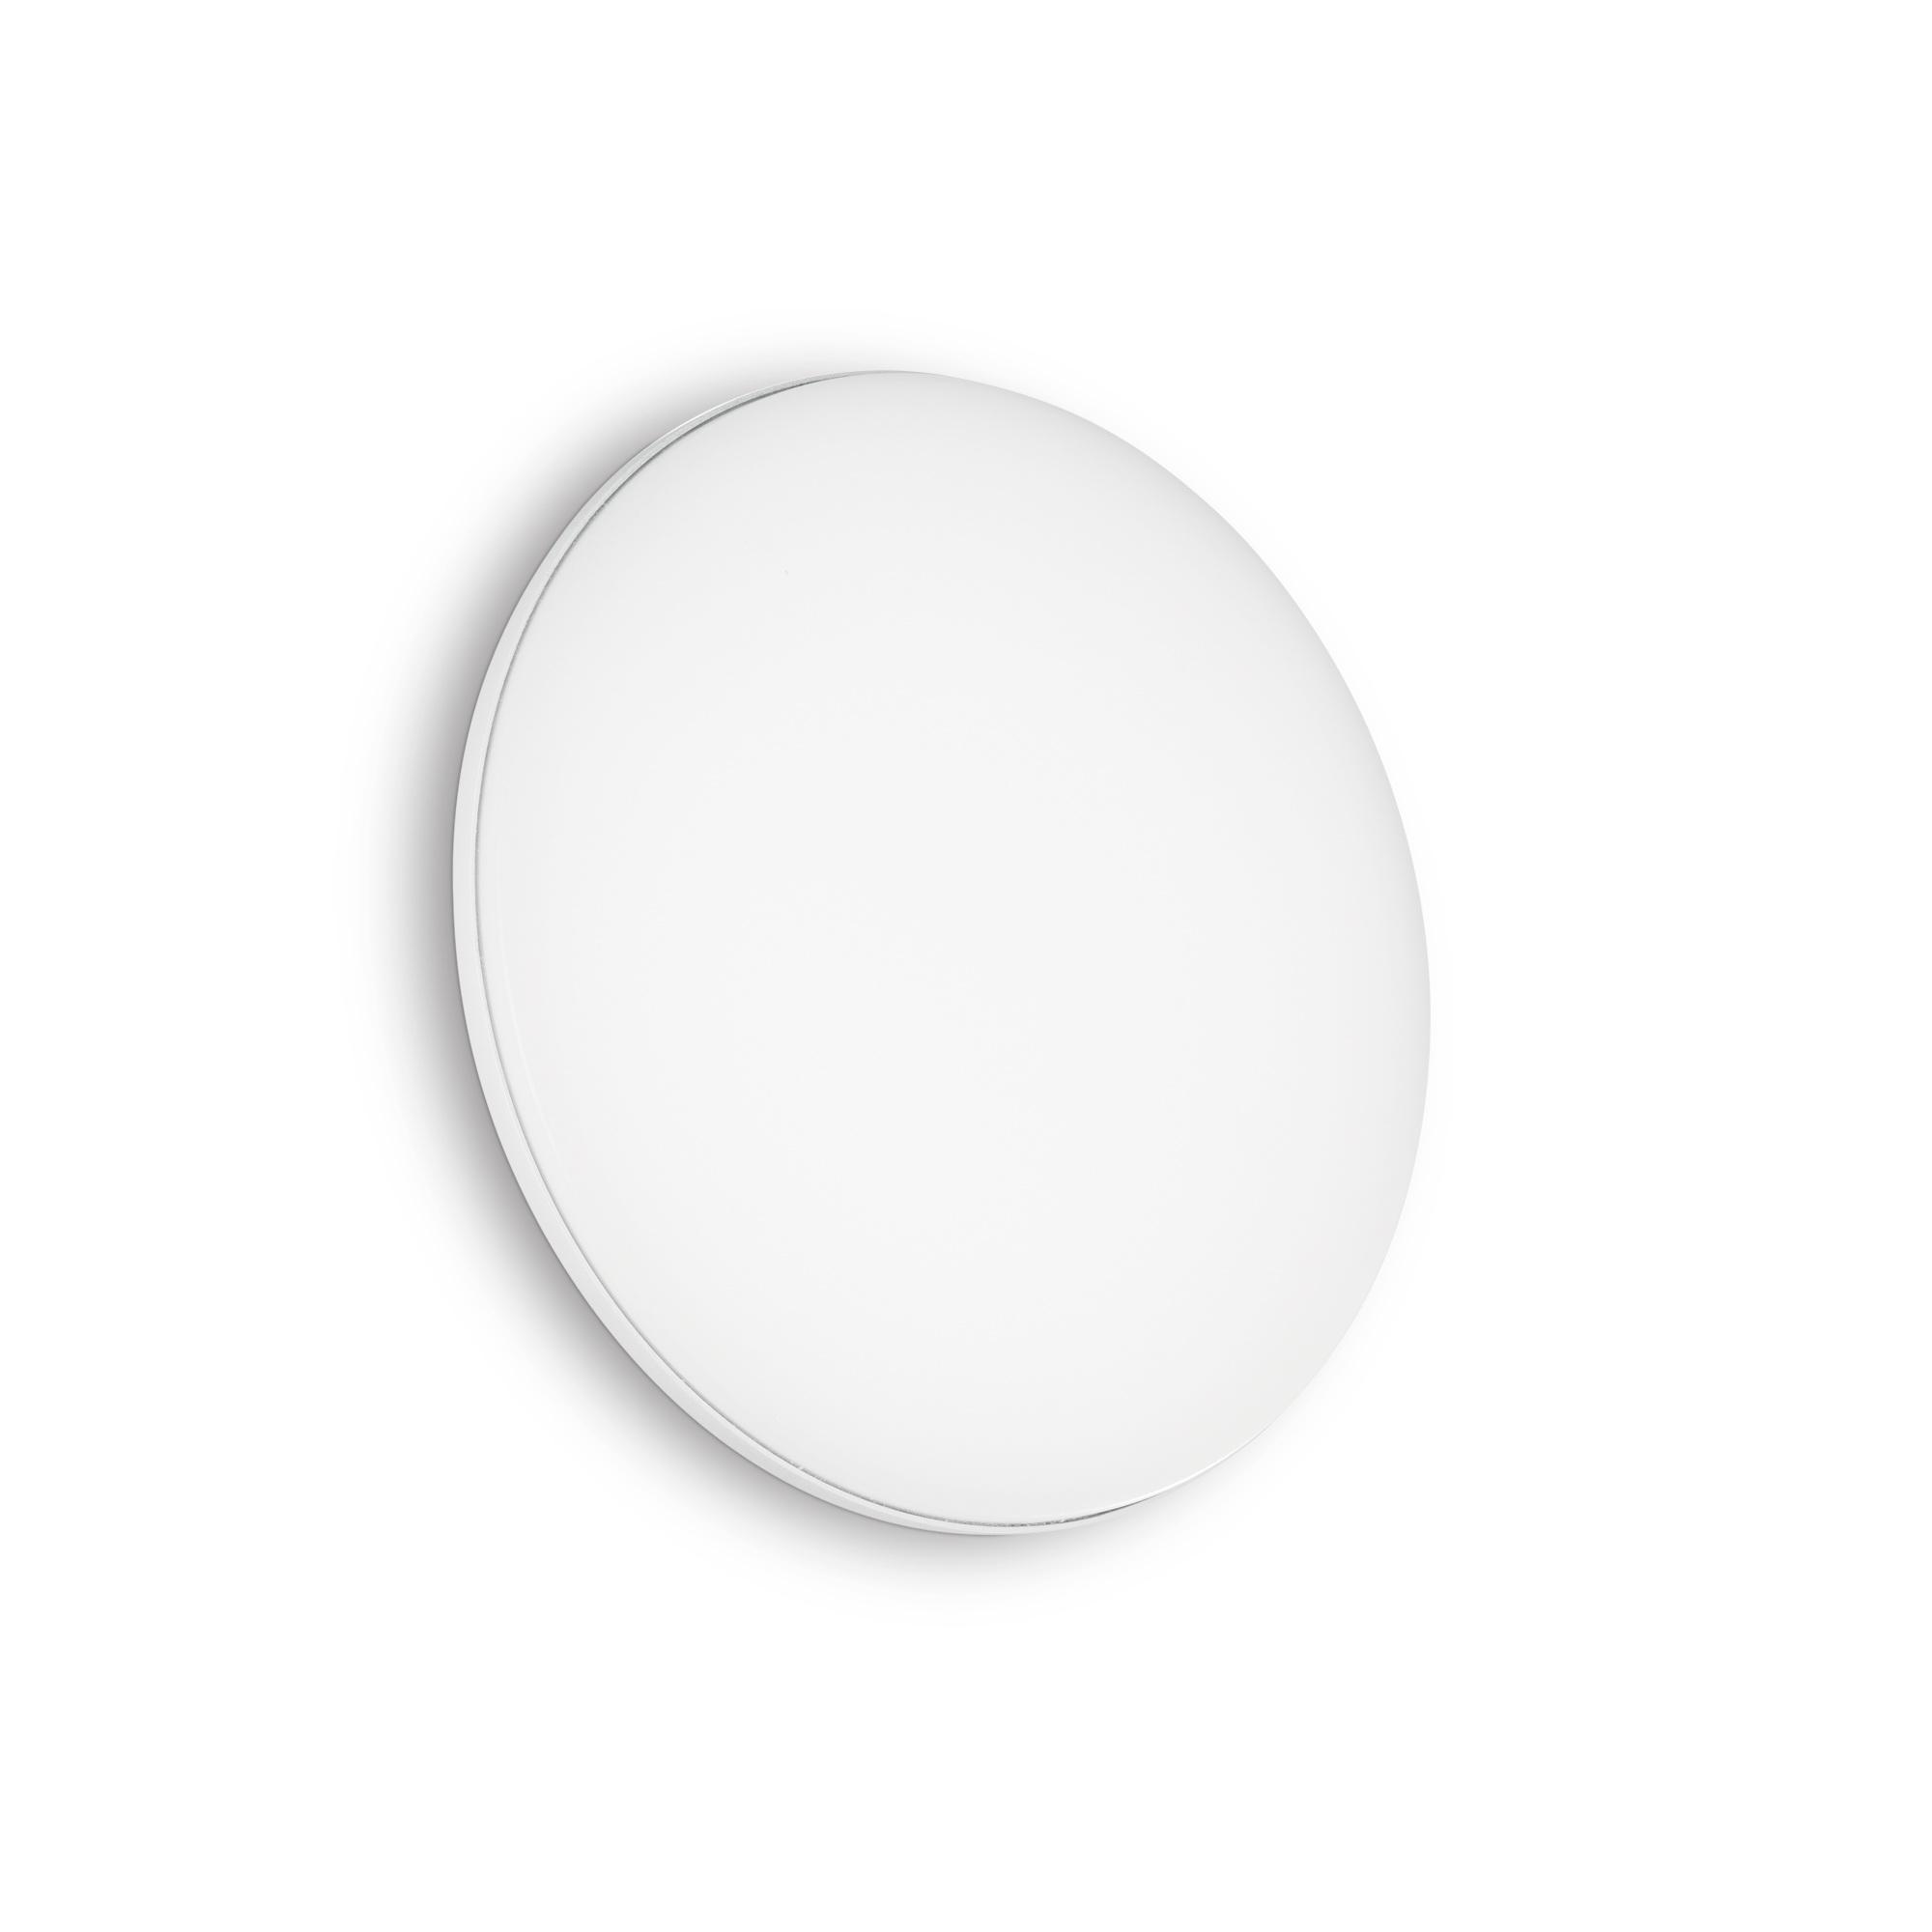 MIB PL1 ROUND уличный потолочный светильник белый